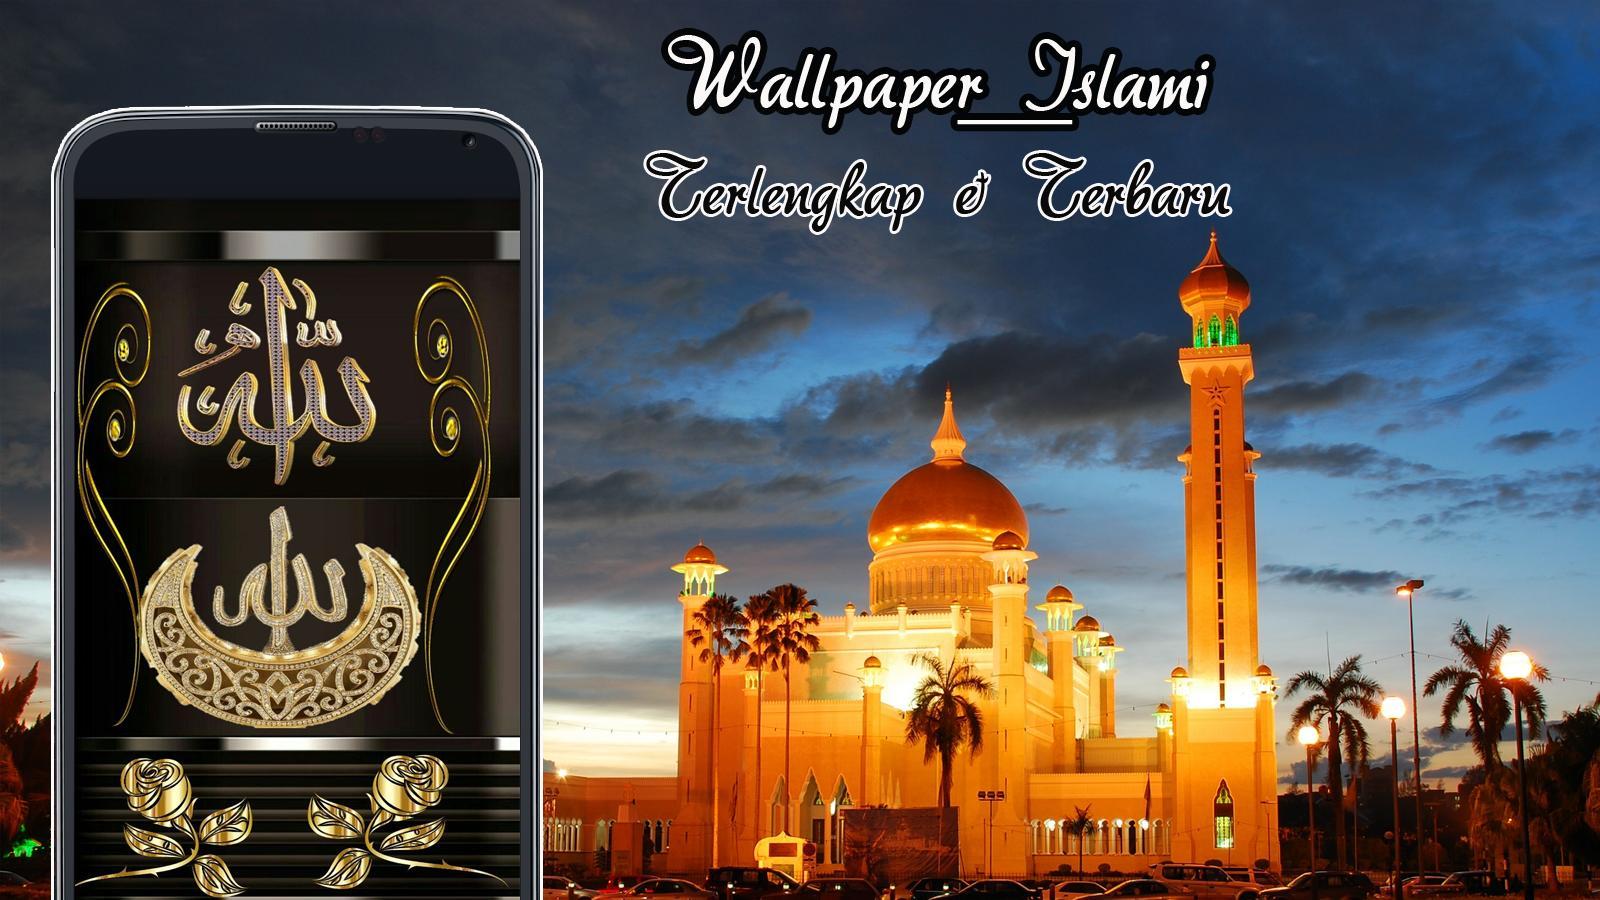 Wallpaper Islami Dan Dp Kata Islami Terbaru для андроид